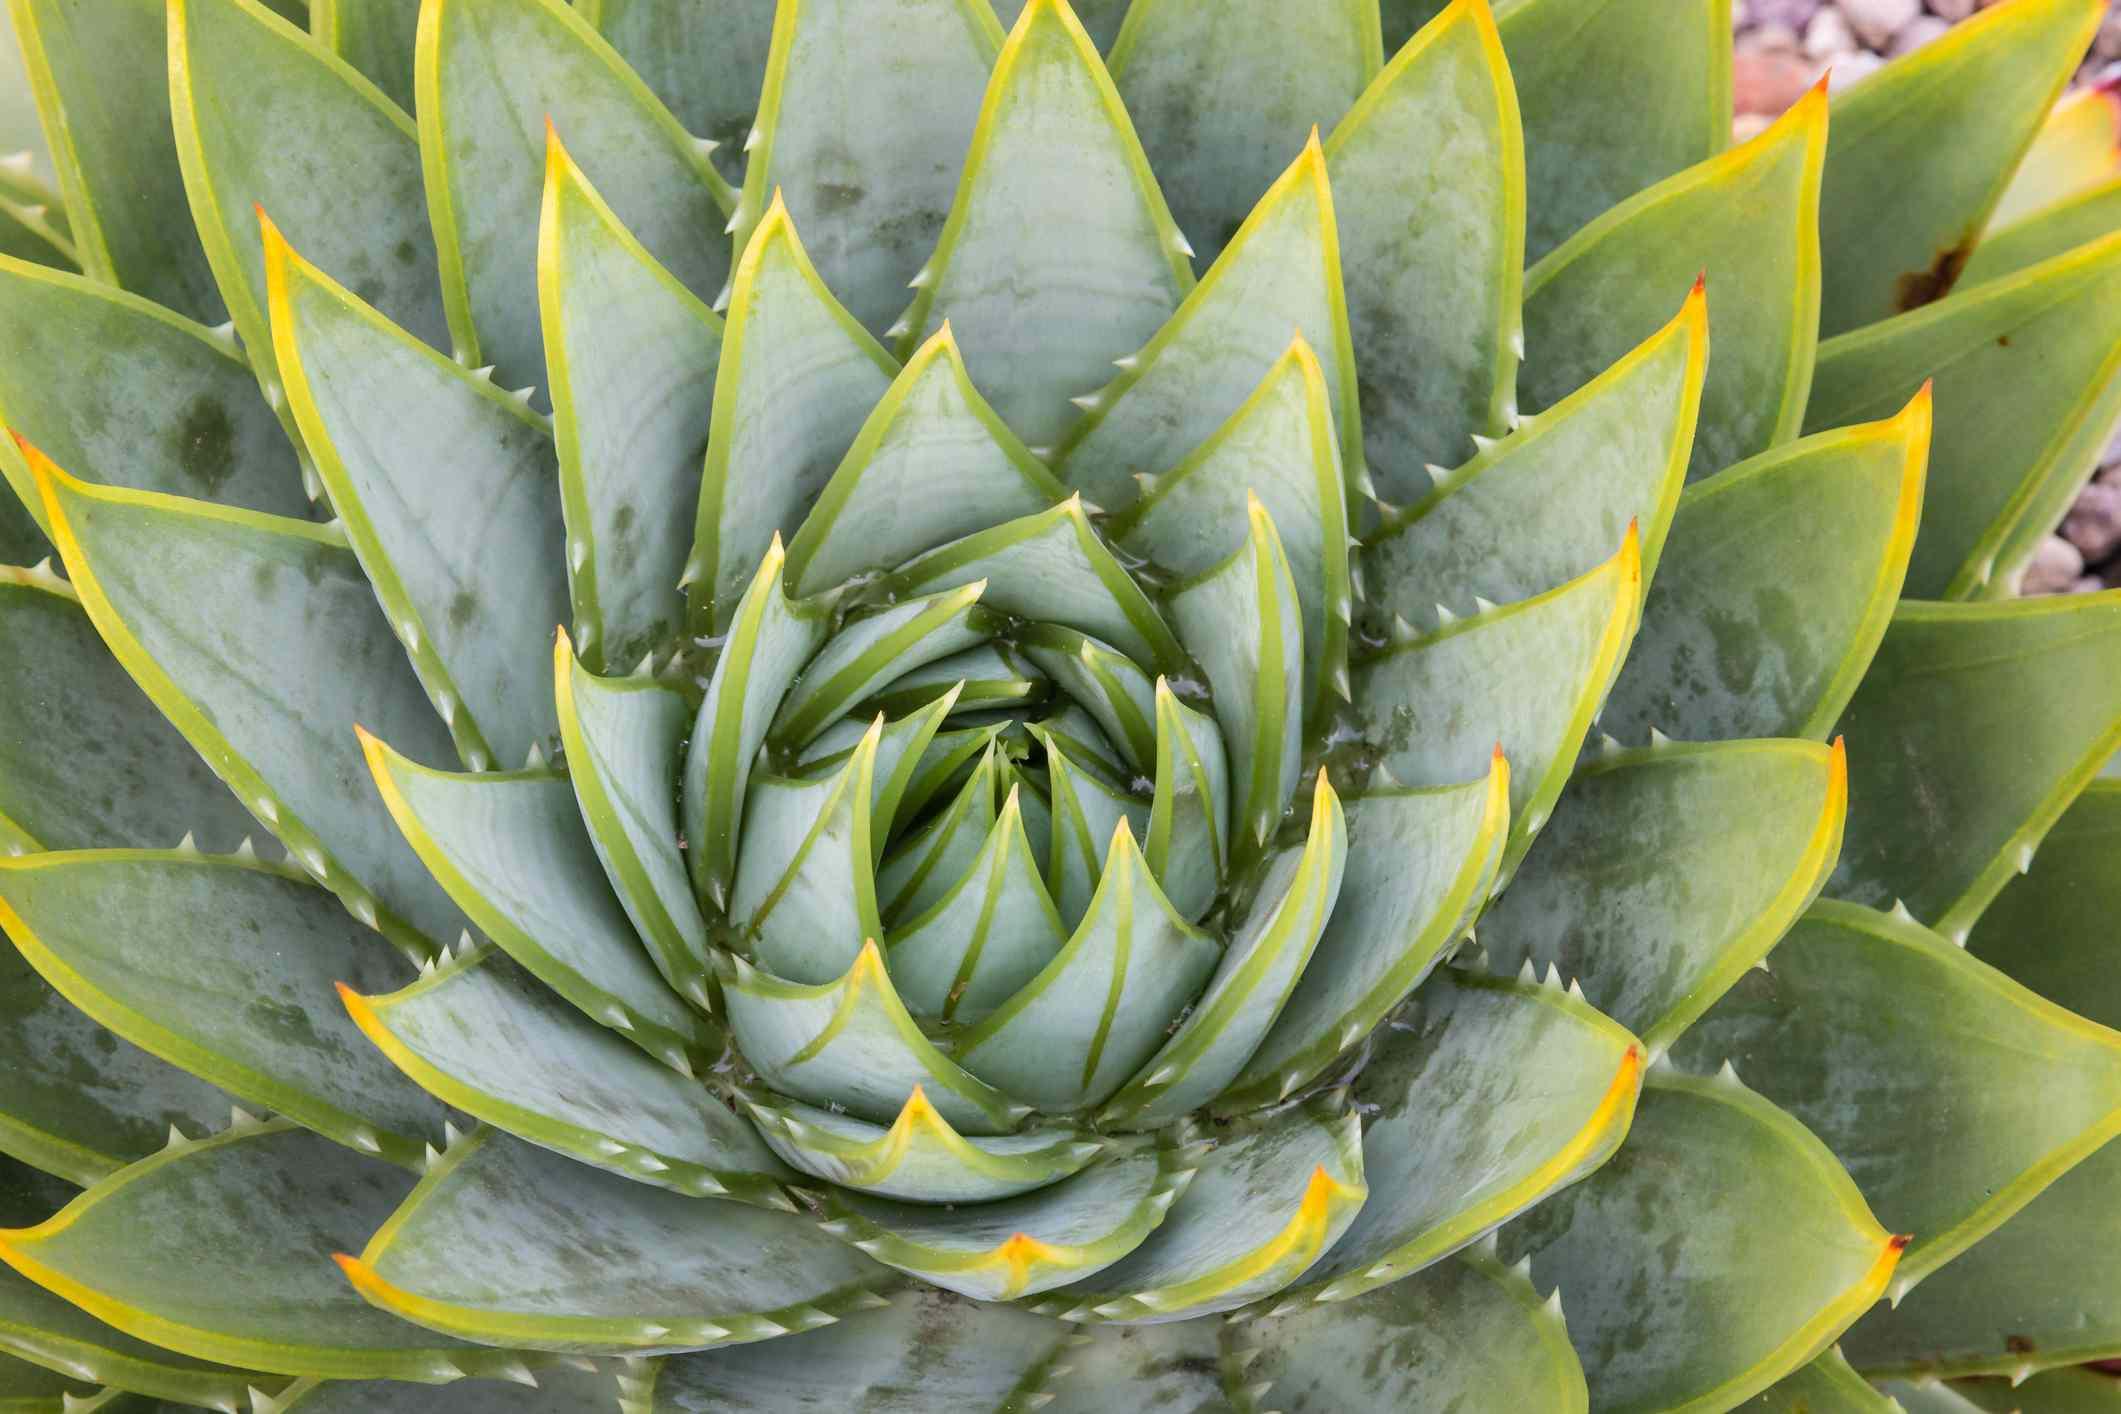 Spiral aloe (Aloe polyphylla) shot from above.